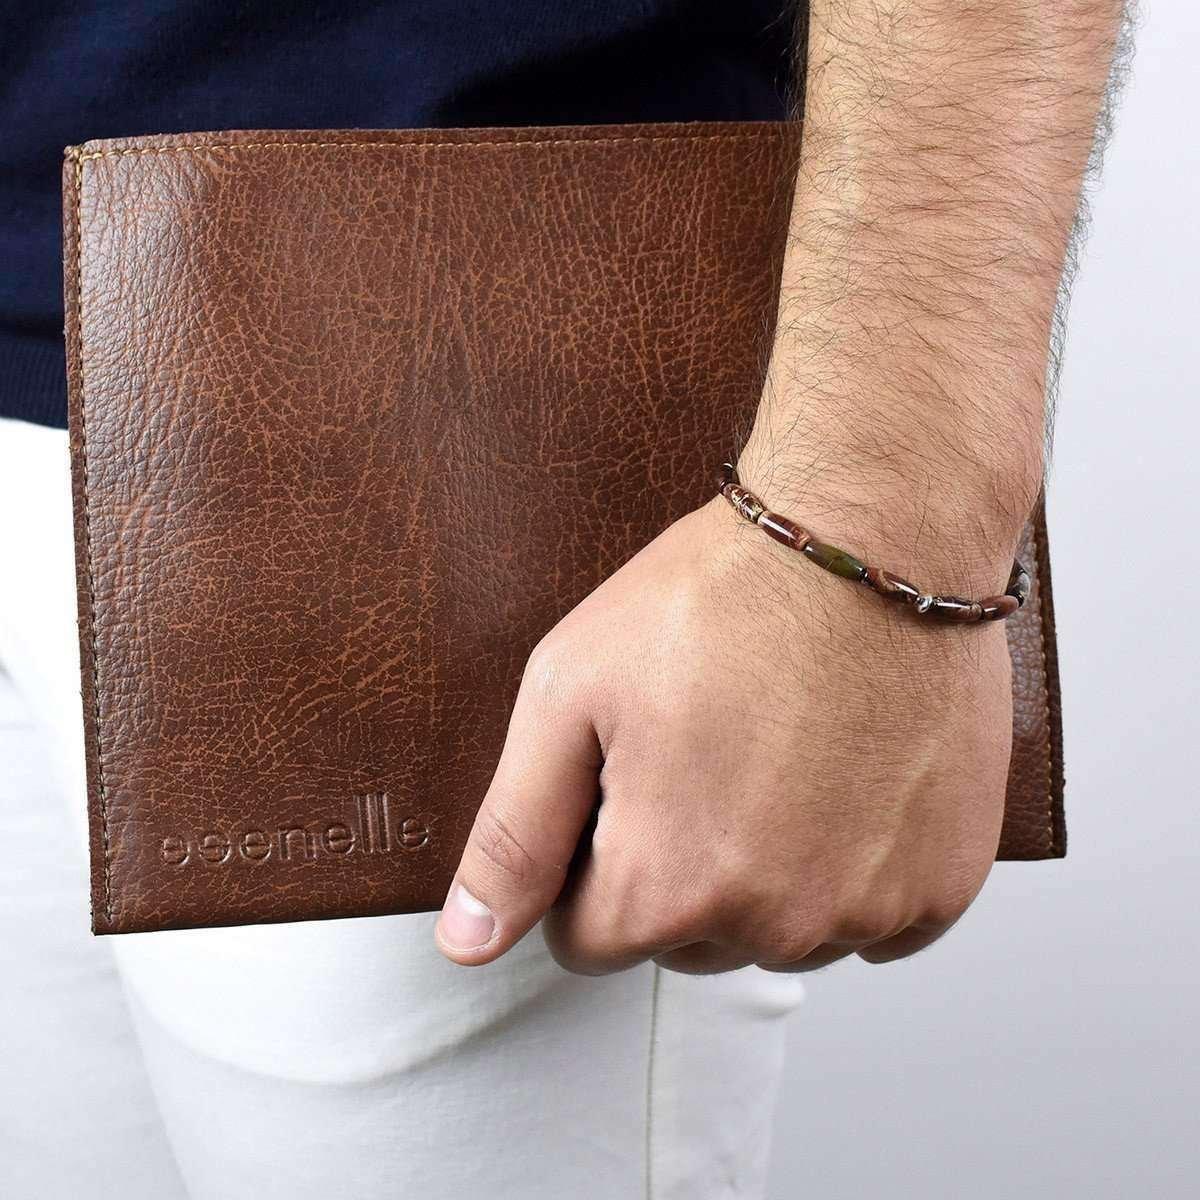 Austin Bracelet - Esenelle